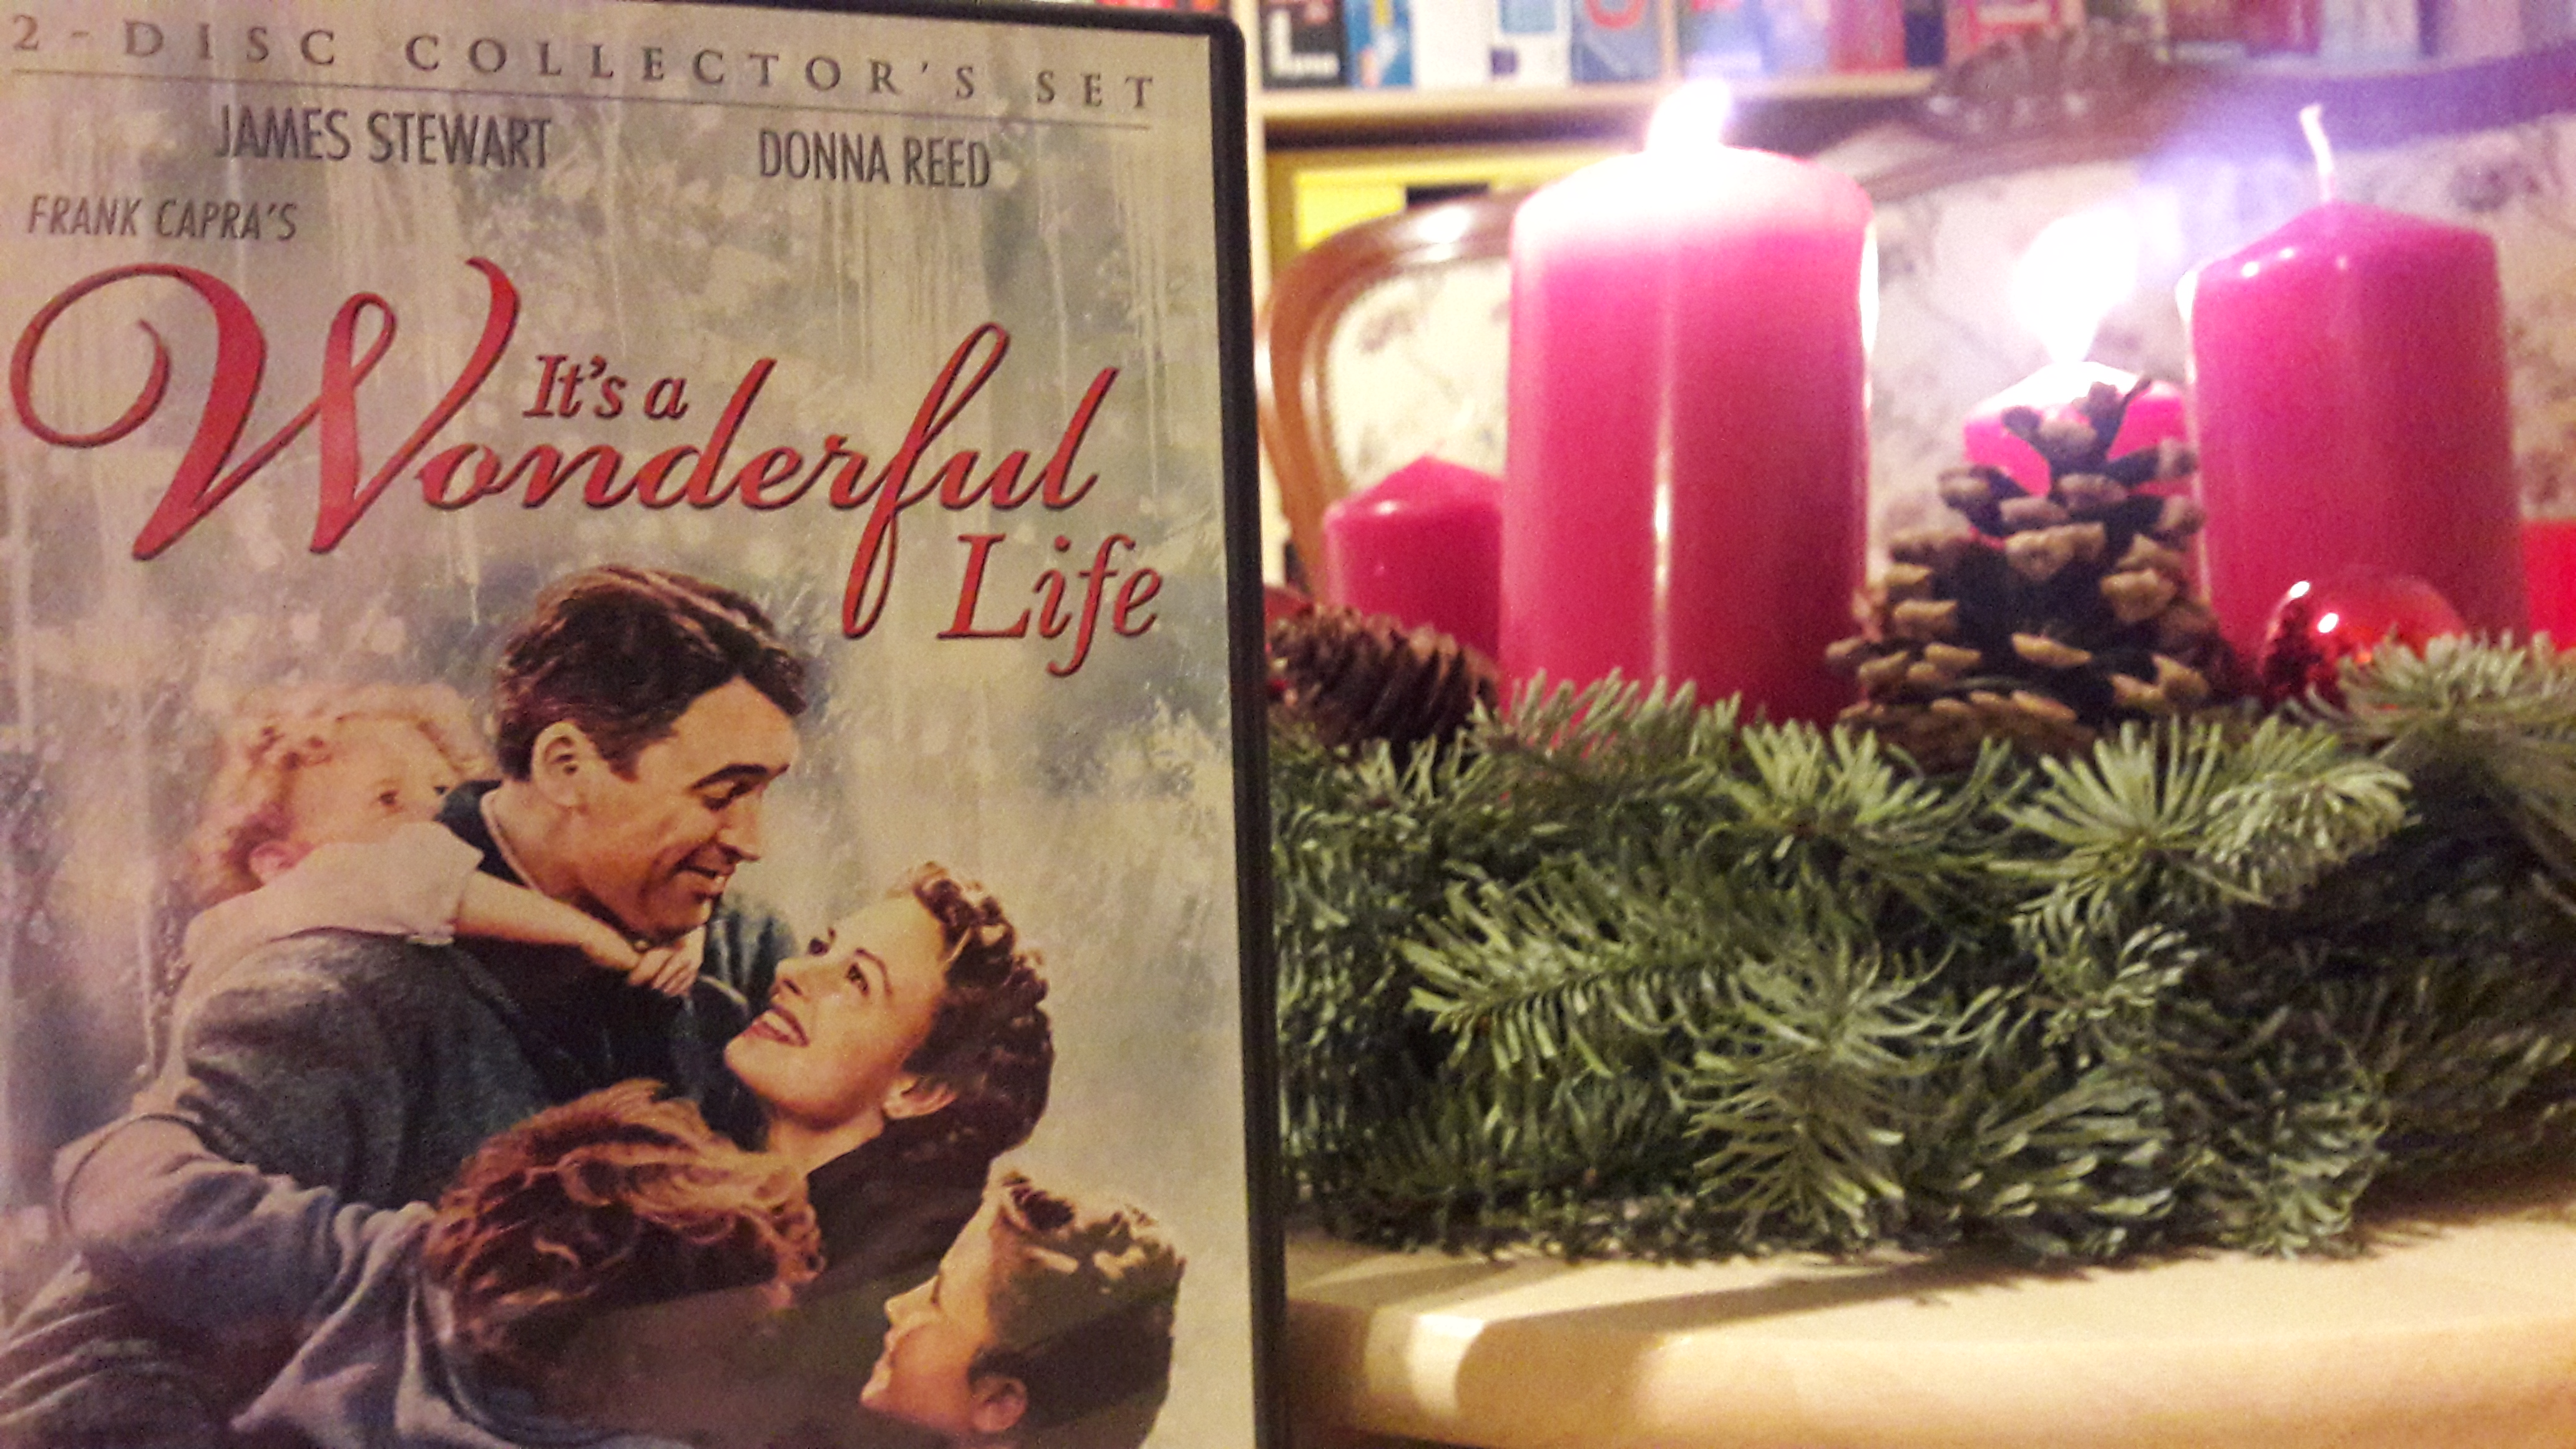 Die Engel, das sind die Anderen: It's a Wonderful Life